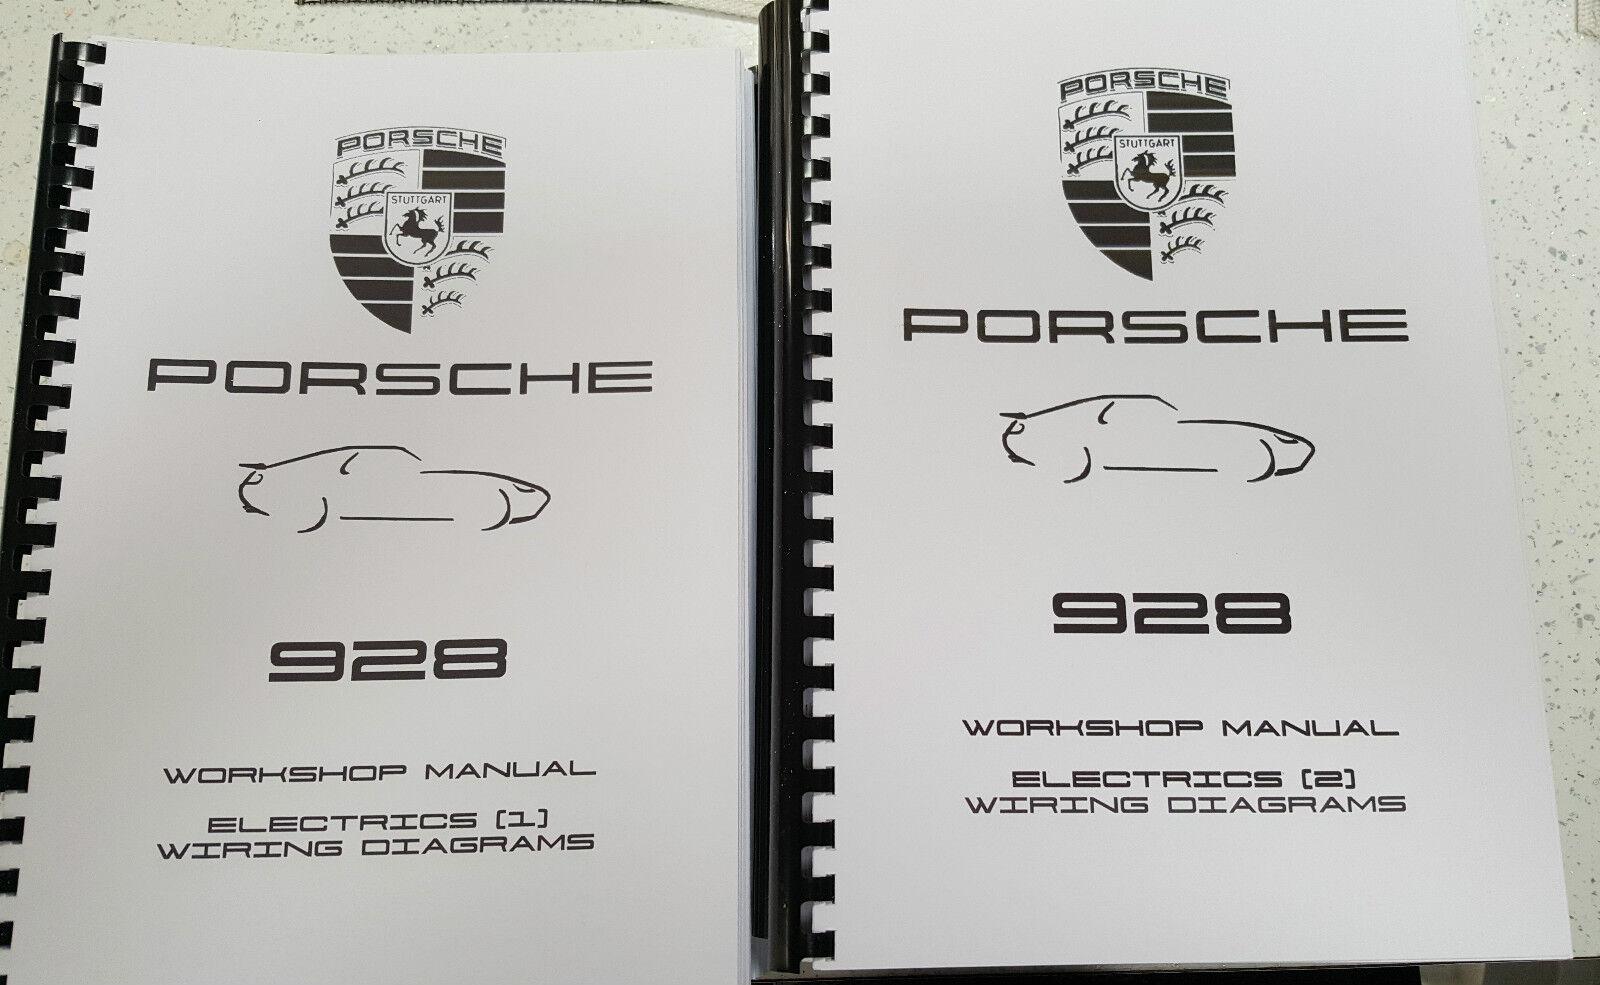 Porsche 928 Workshop Manual Reprinted 1978 1994 Inc Wiring Diagrams Diagram